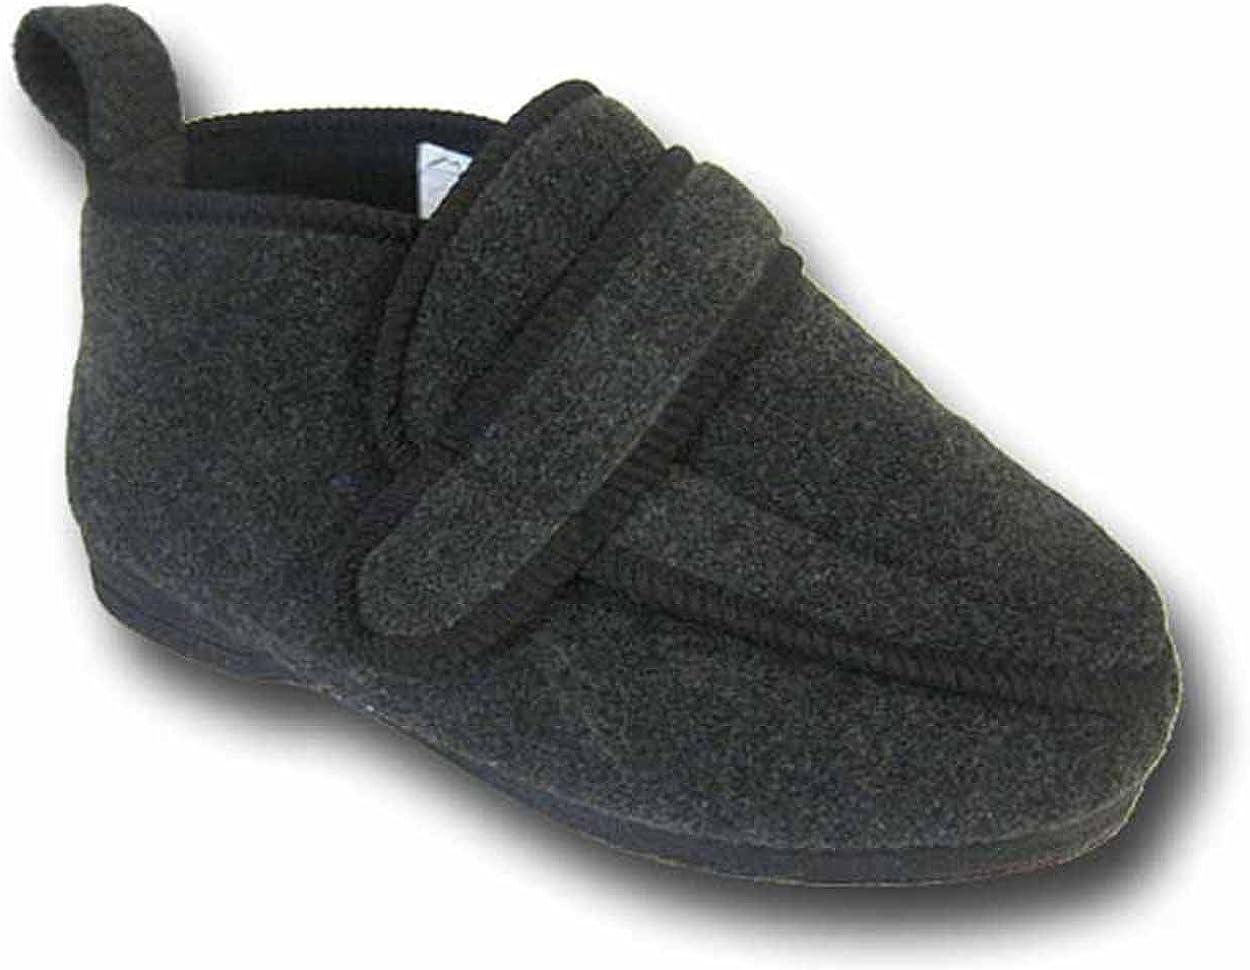 Coolers Mens Charcoal Grey Orthopaedic